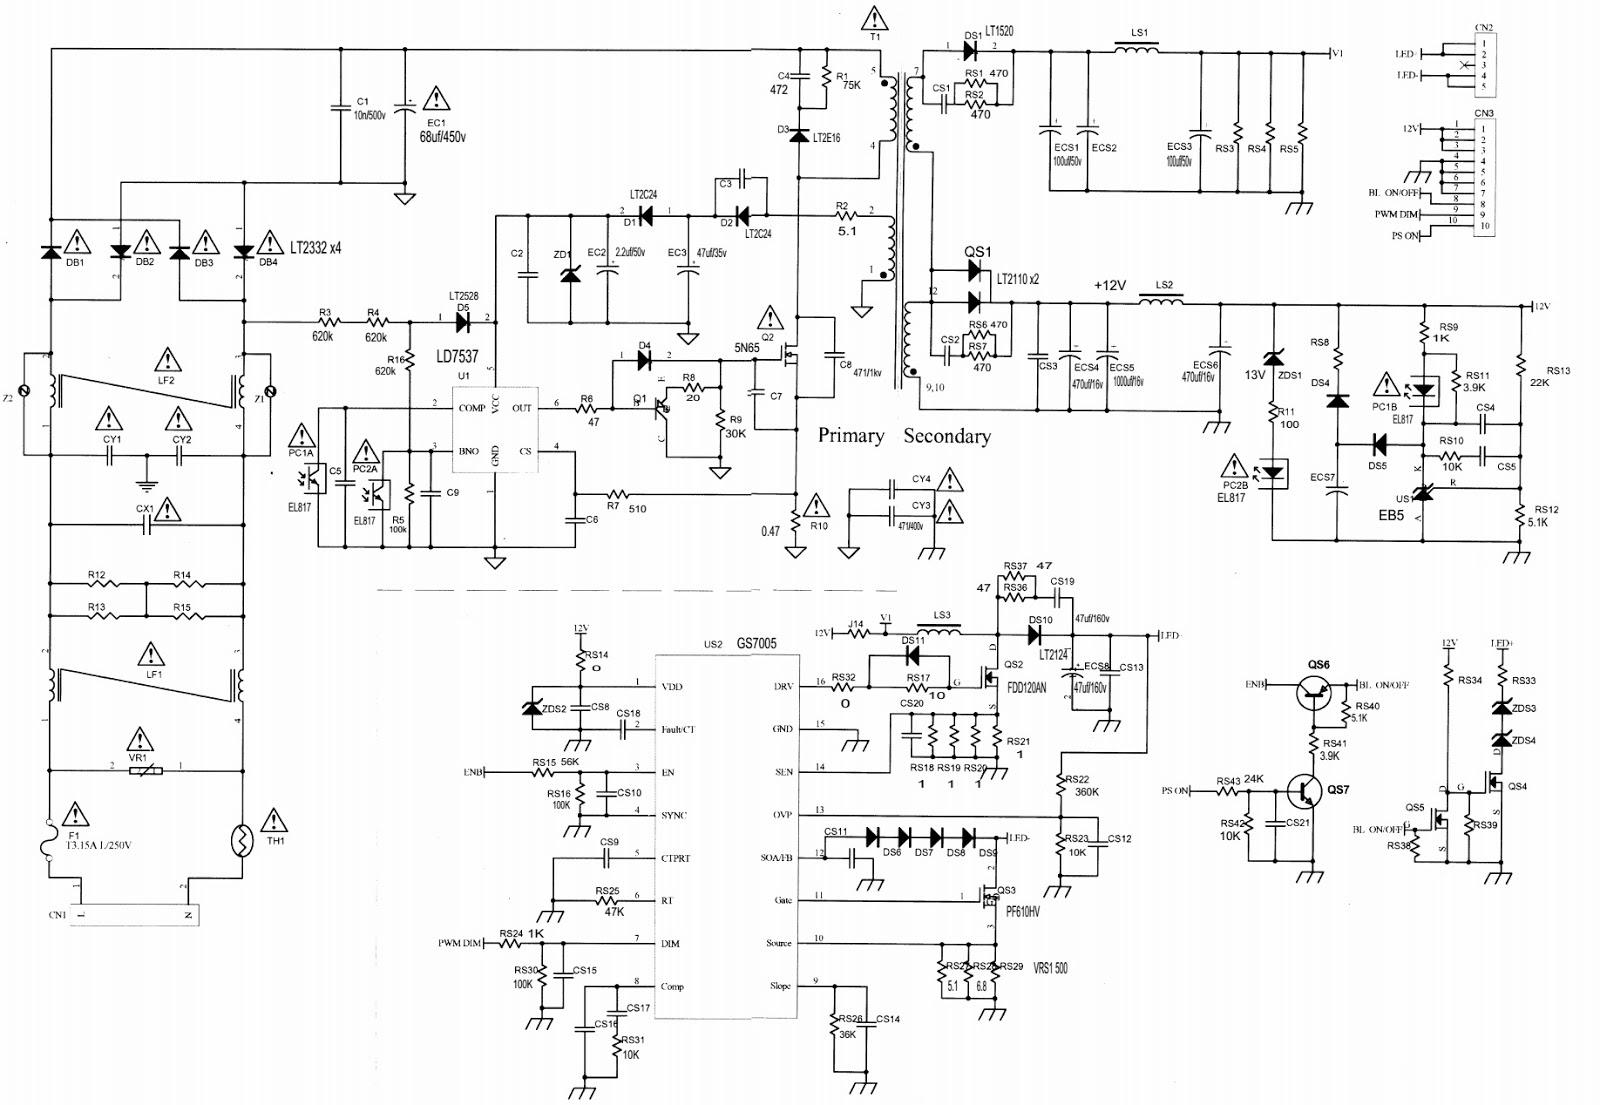 BN44 00338B used with Samsung LE26C450E, Samsung LN32C450